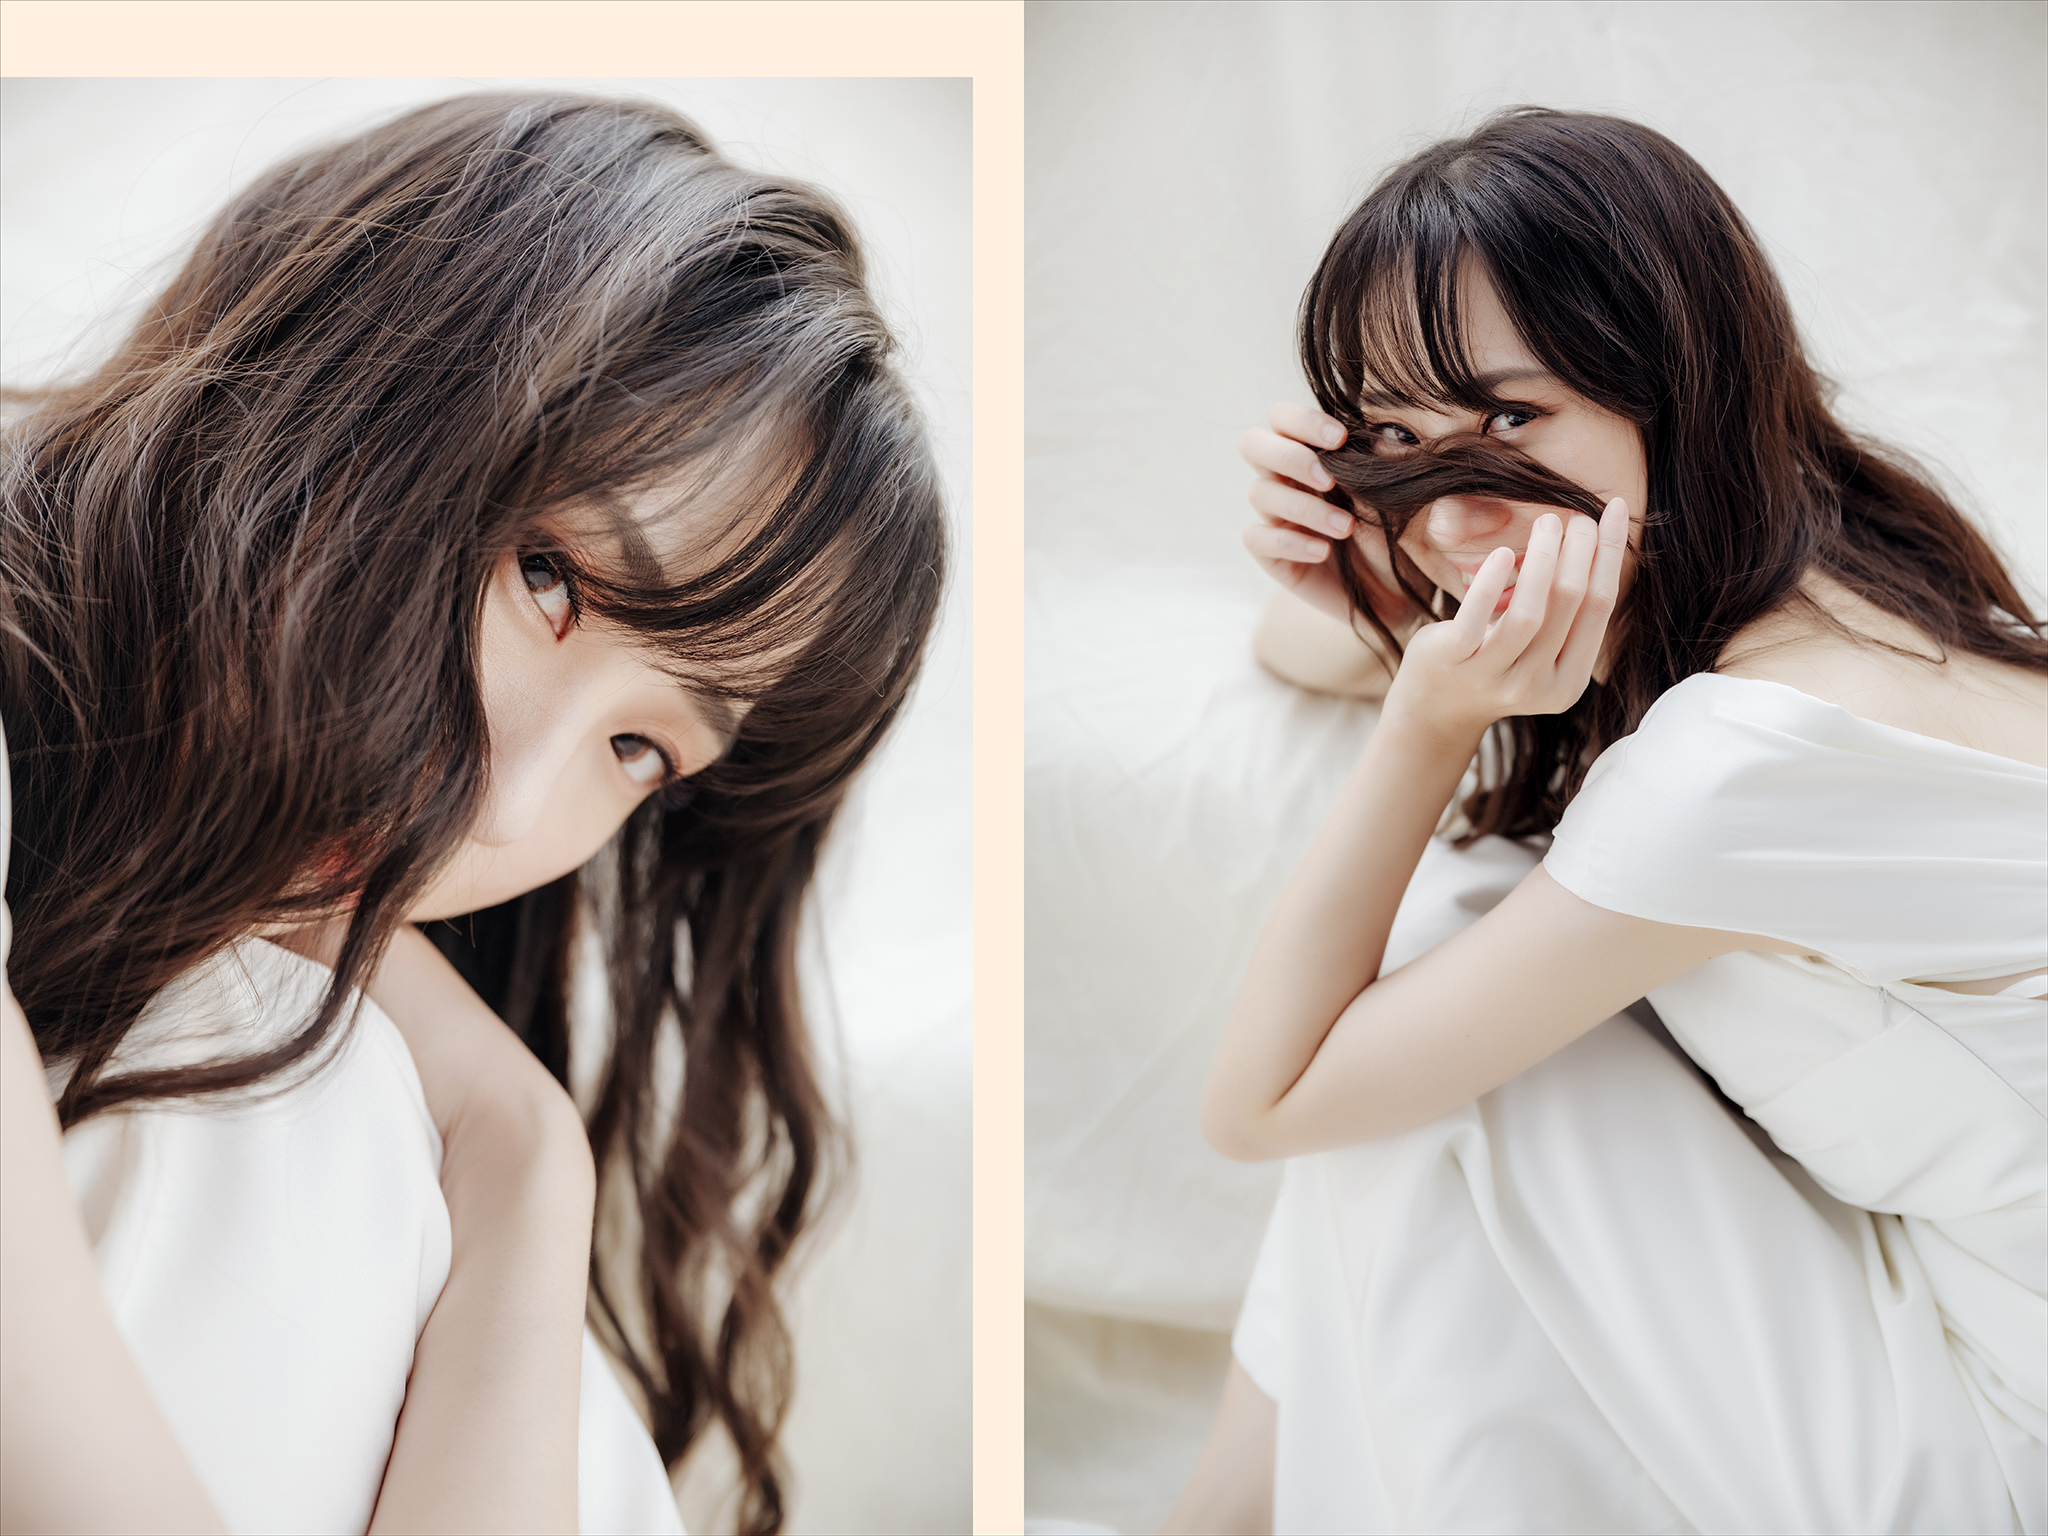 50659285358 c9738fe496 o - 【自主婚紗】+Melody+